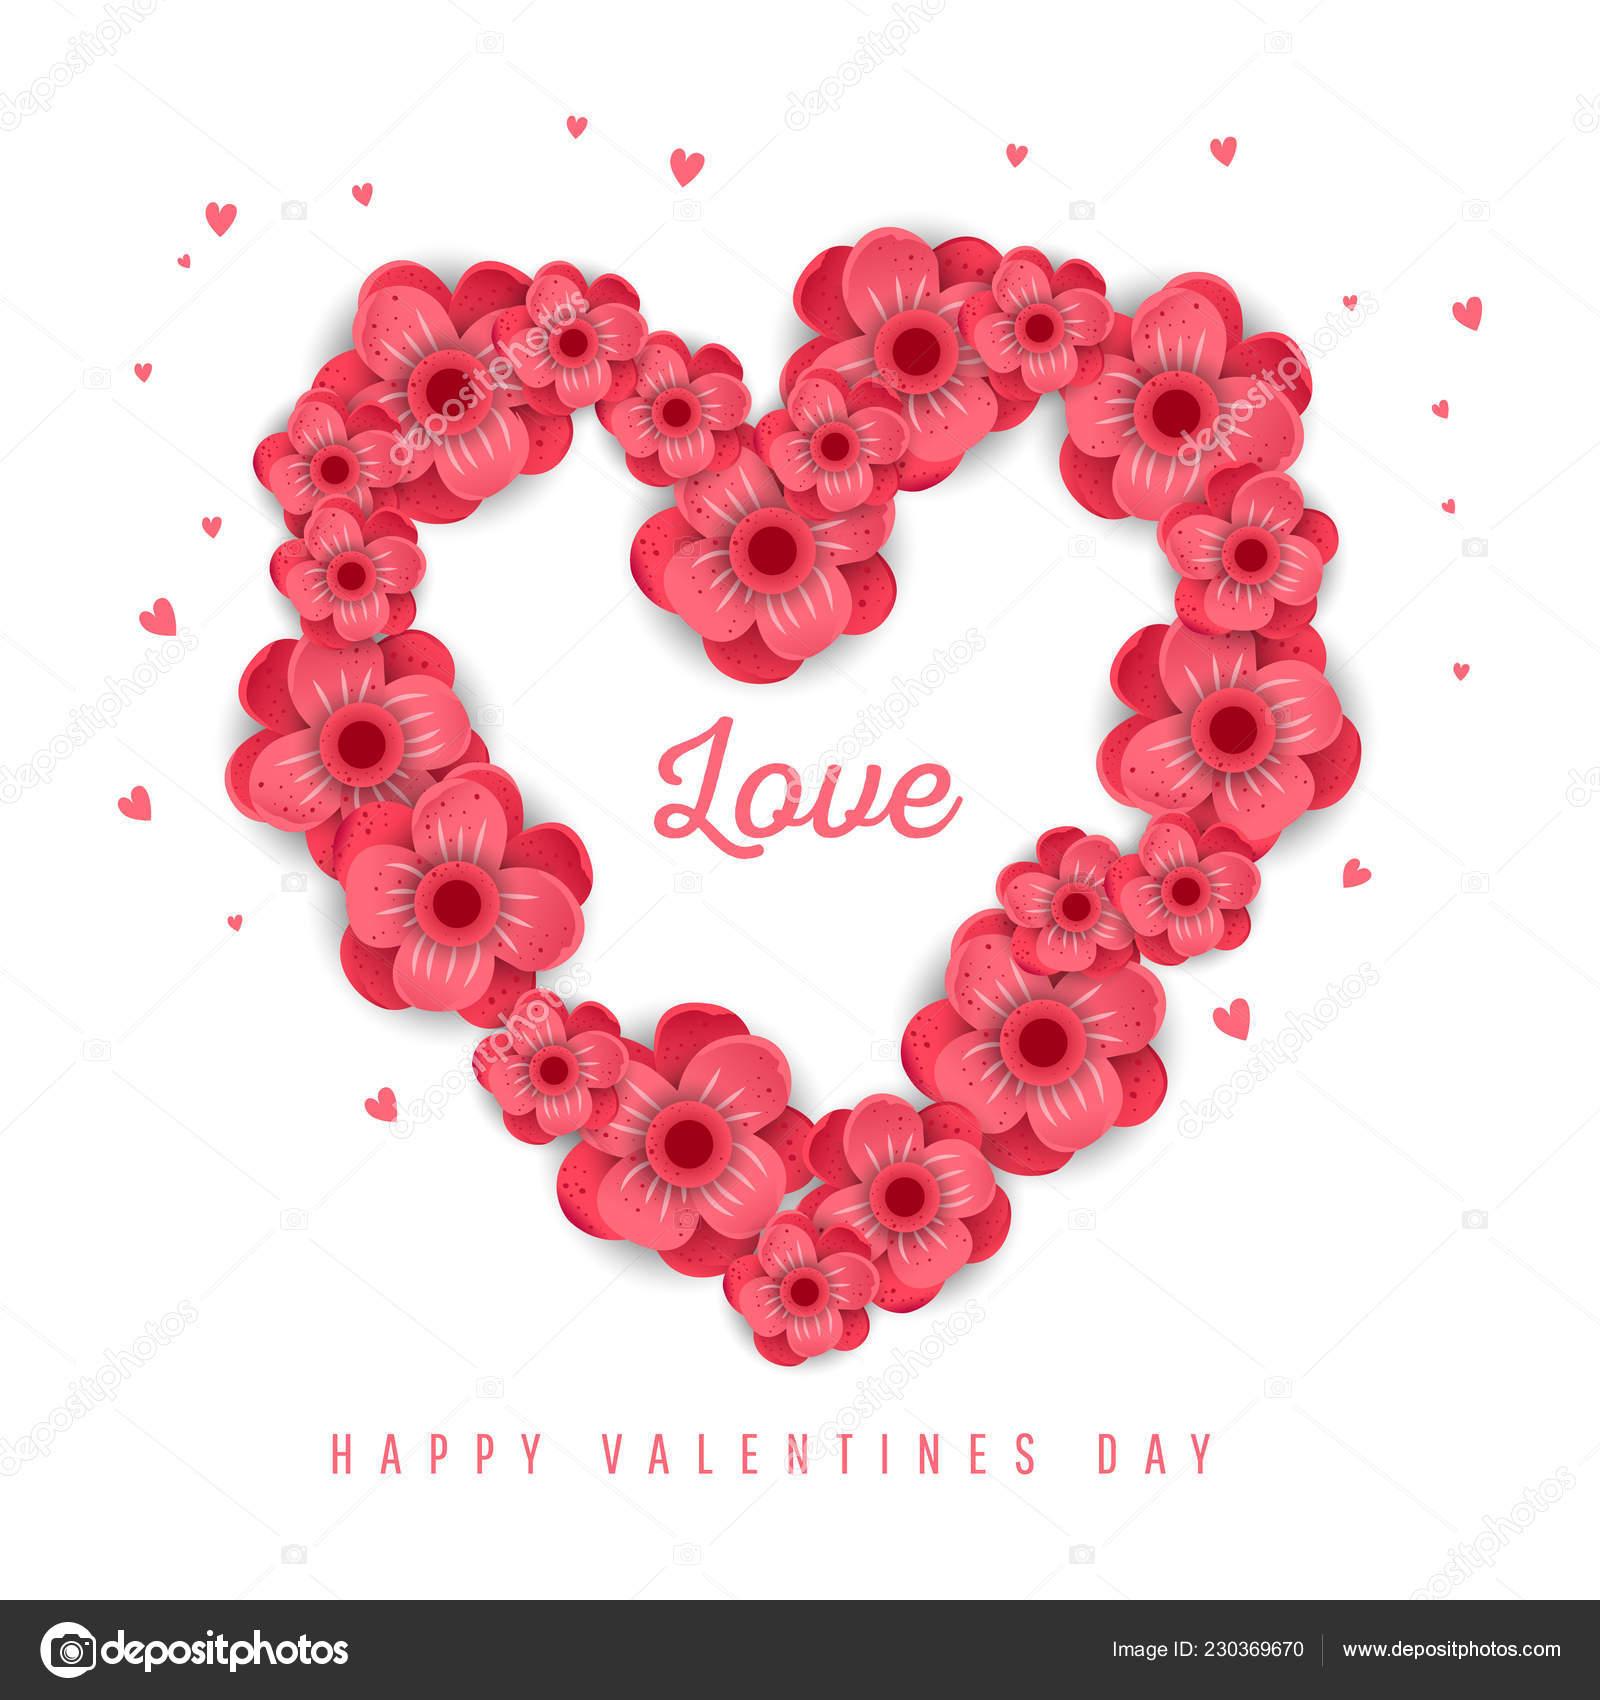 Happy Valentine S Day Design Stock Vector C Irinashatilova 230369670